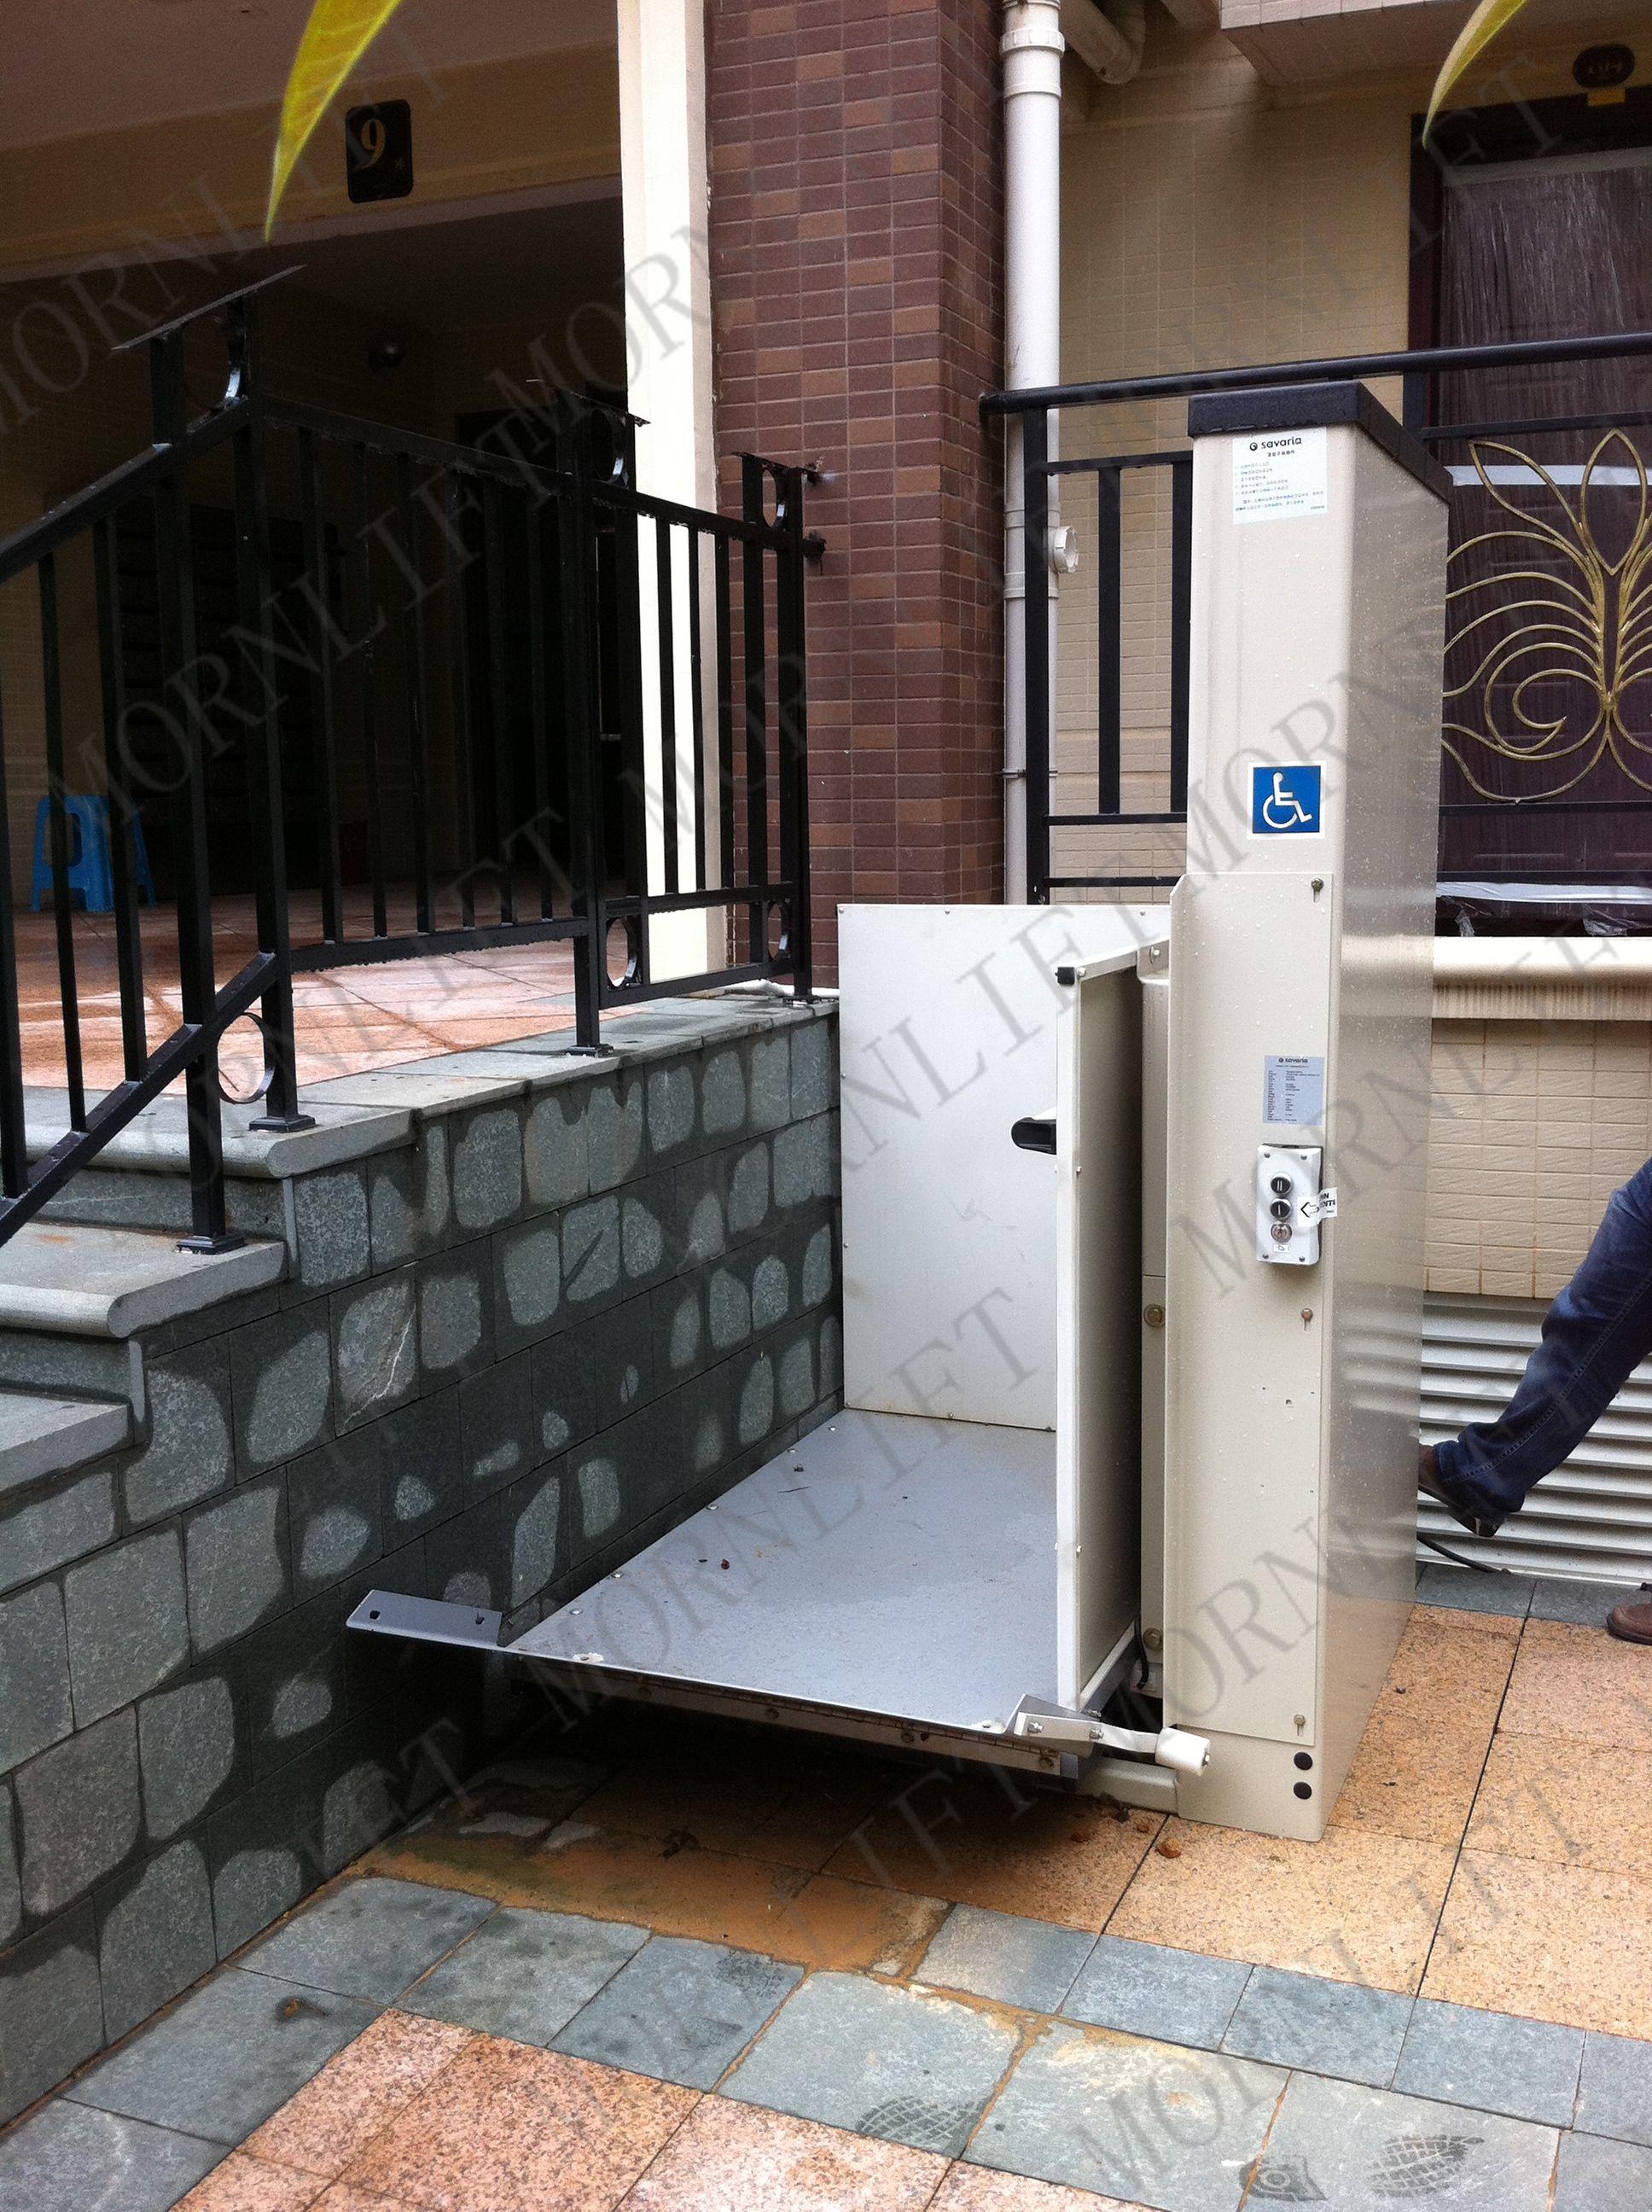 Wheelchair Elevator Slingback Patio Chairs Repair Lift Vertical Platform Disabled